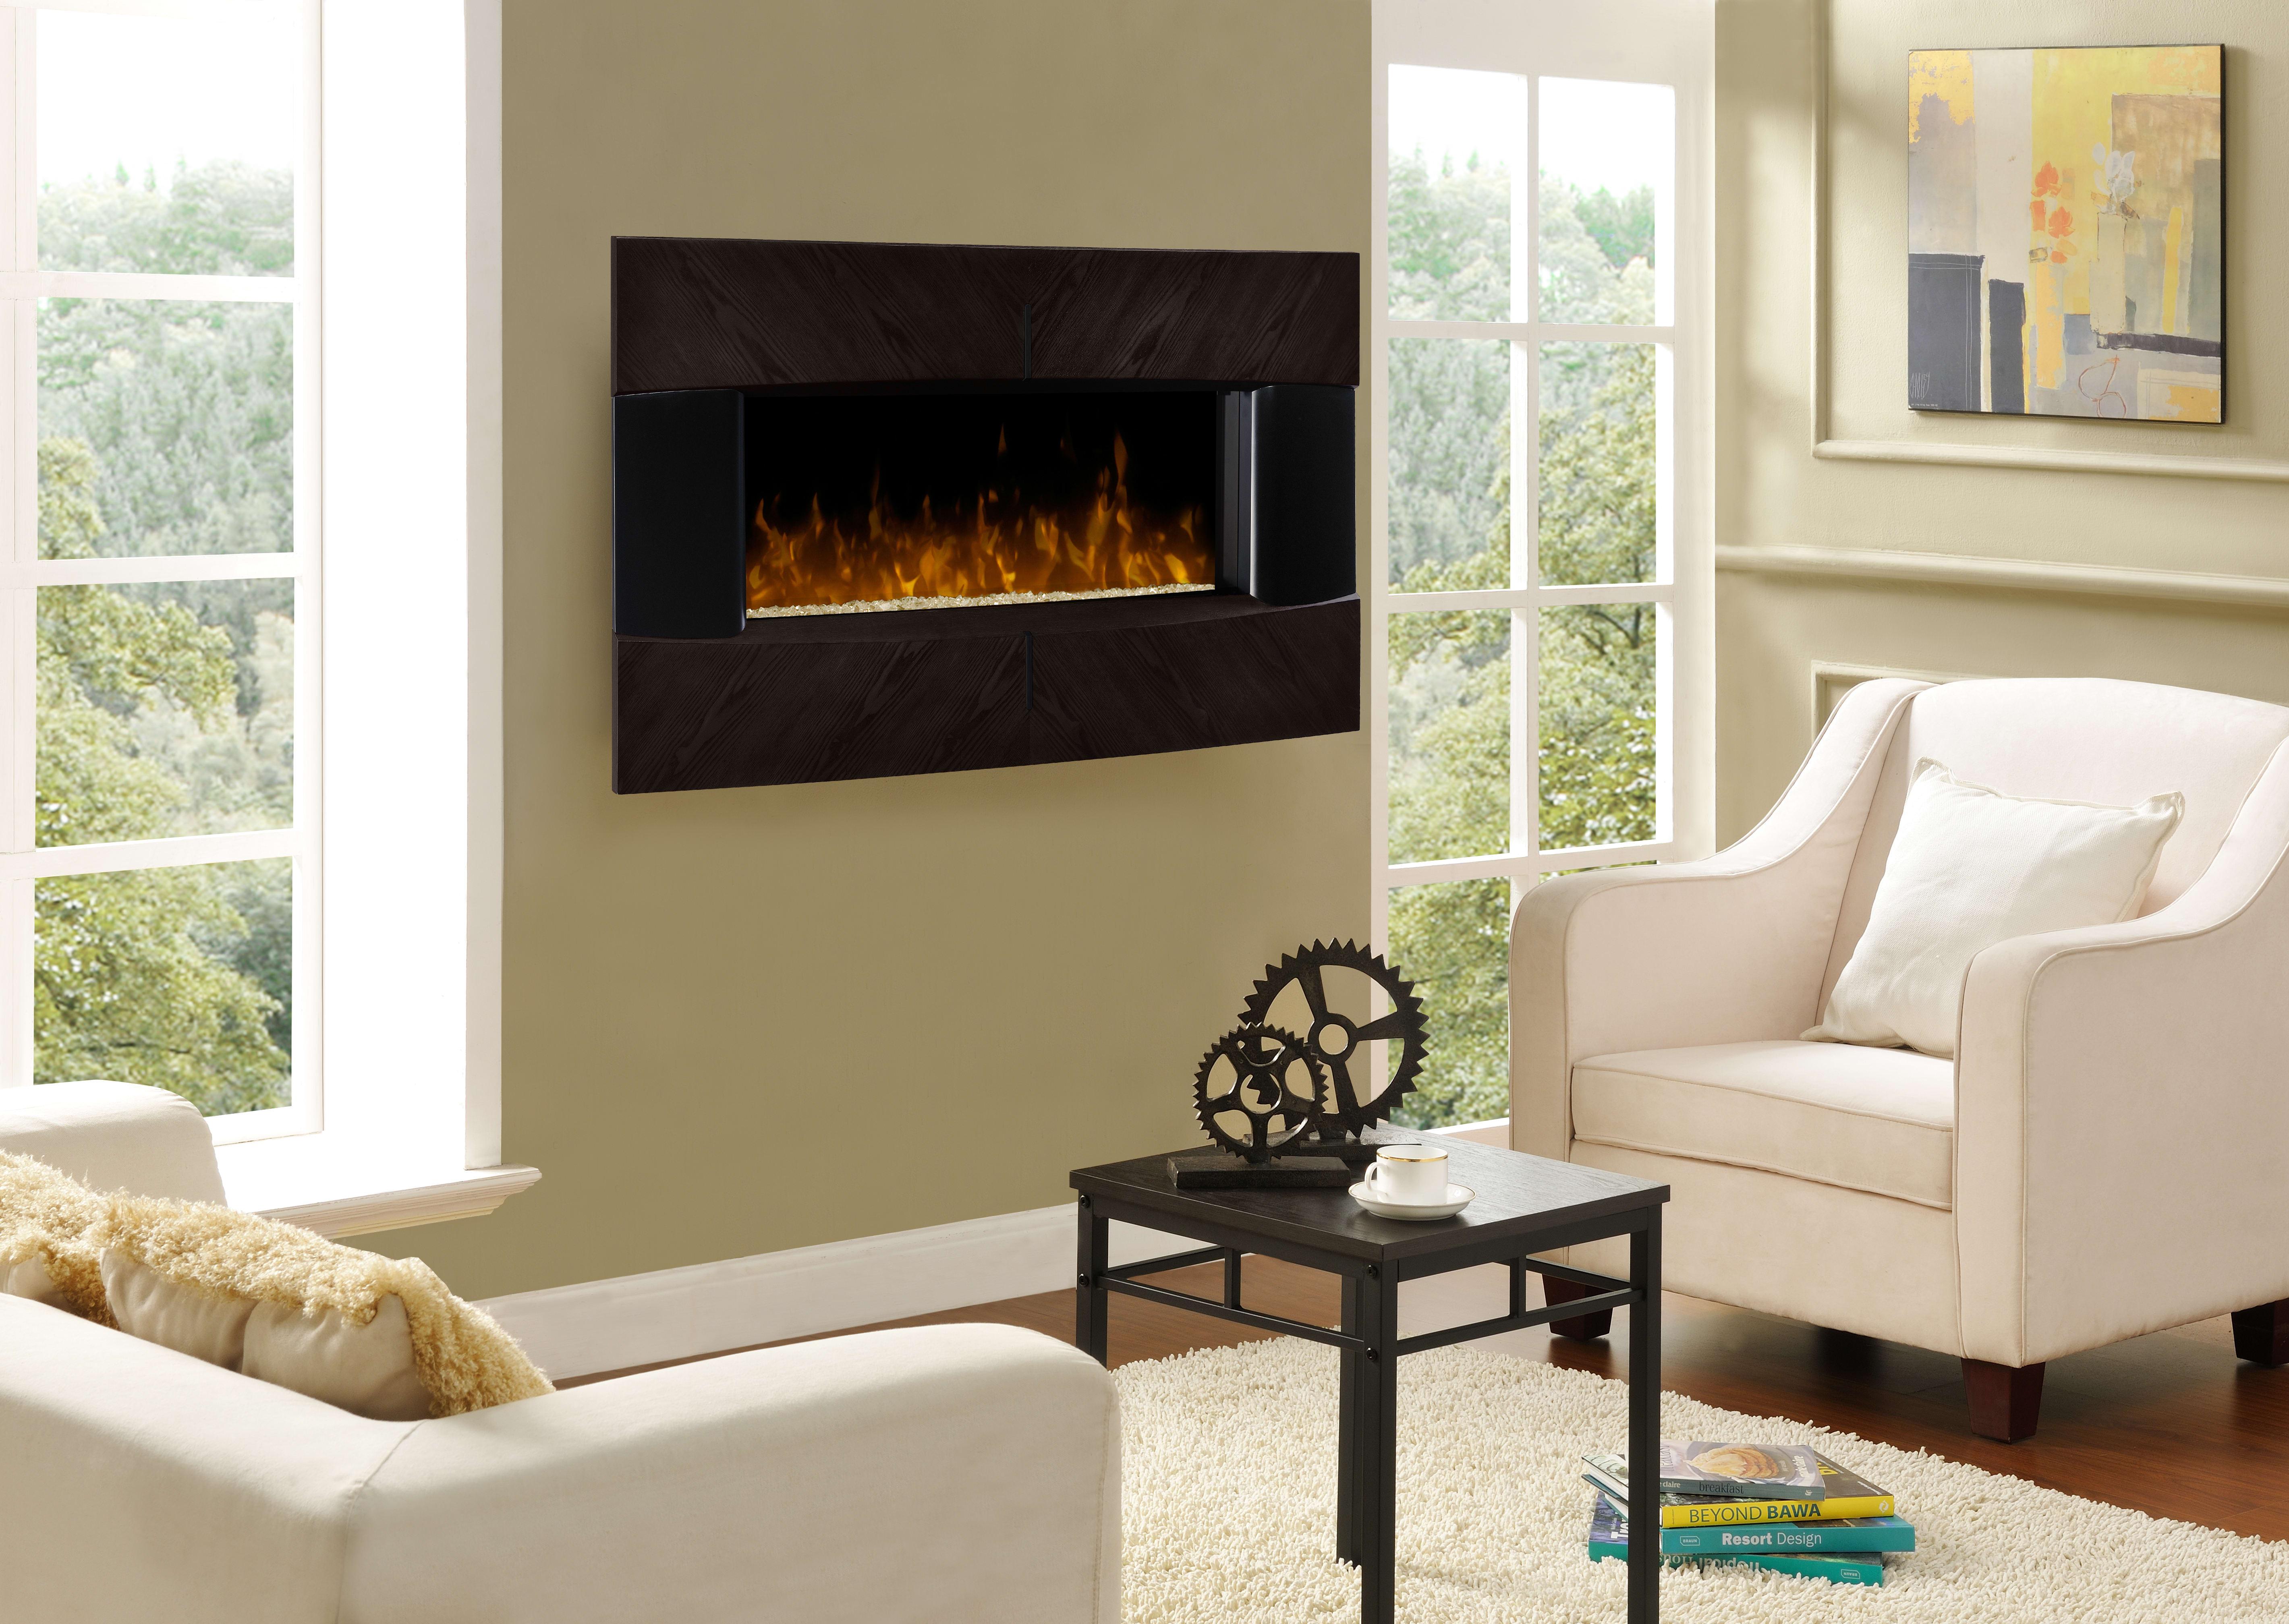 dimplex dwf36g 1482e waltz 51 inch wall mount fireplace